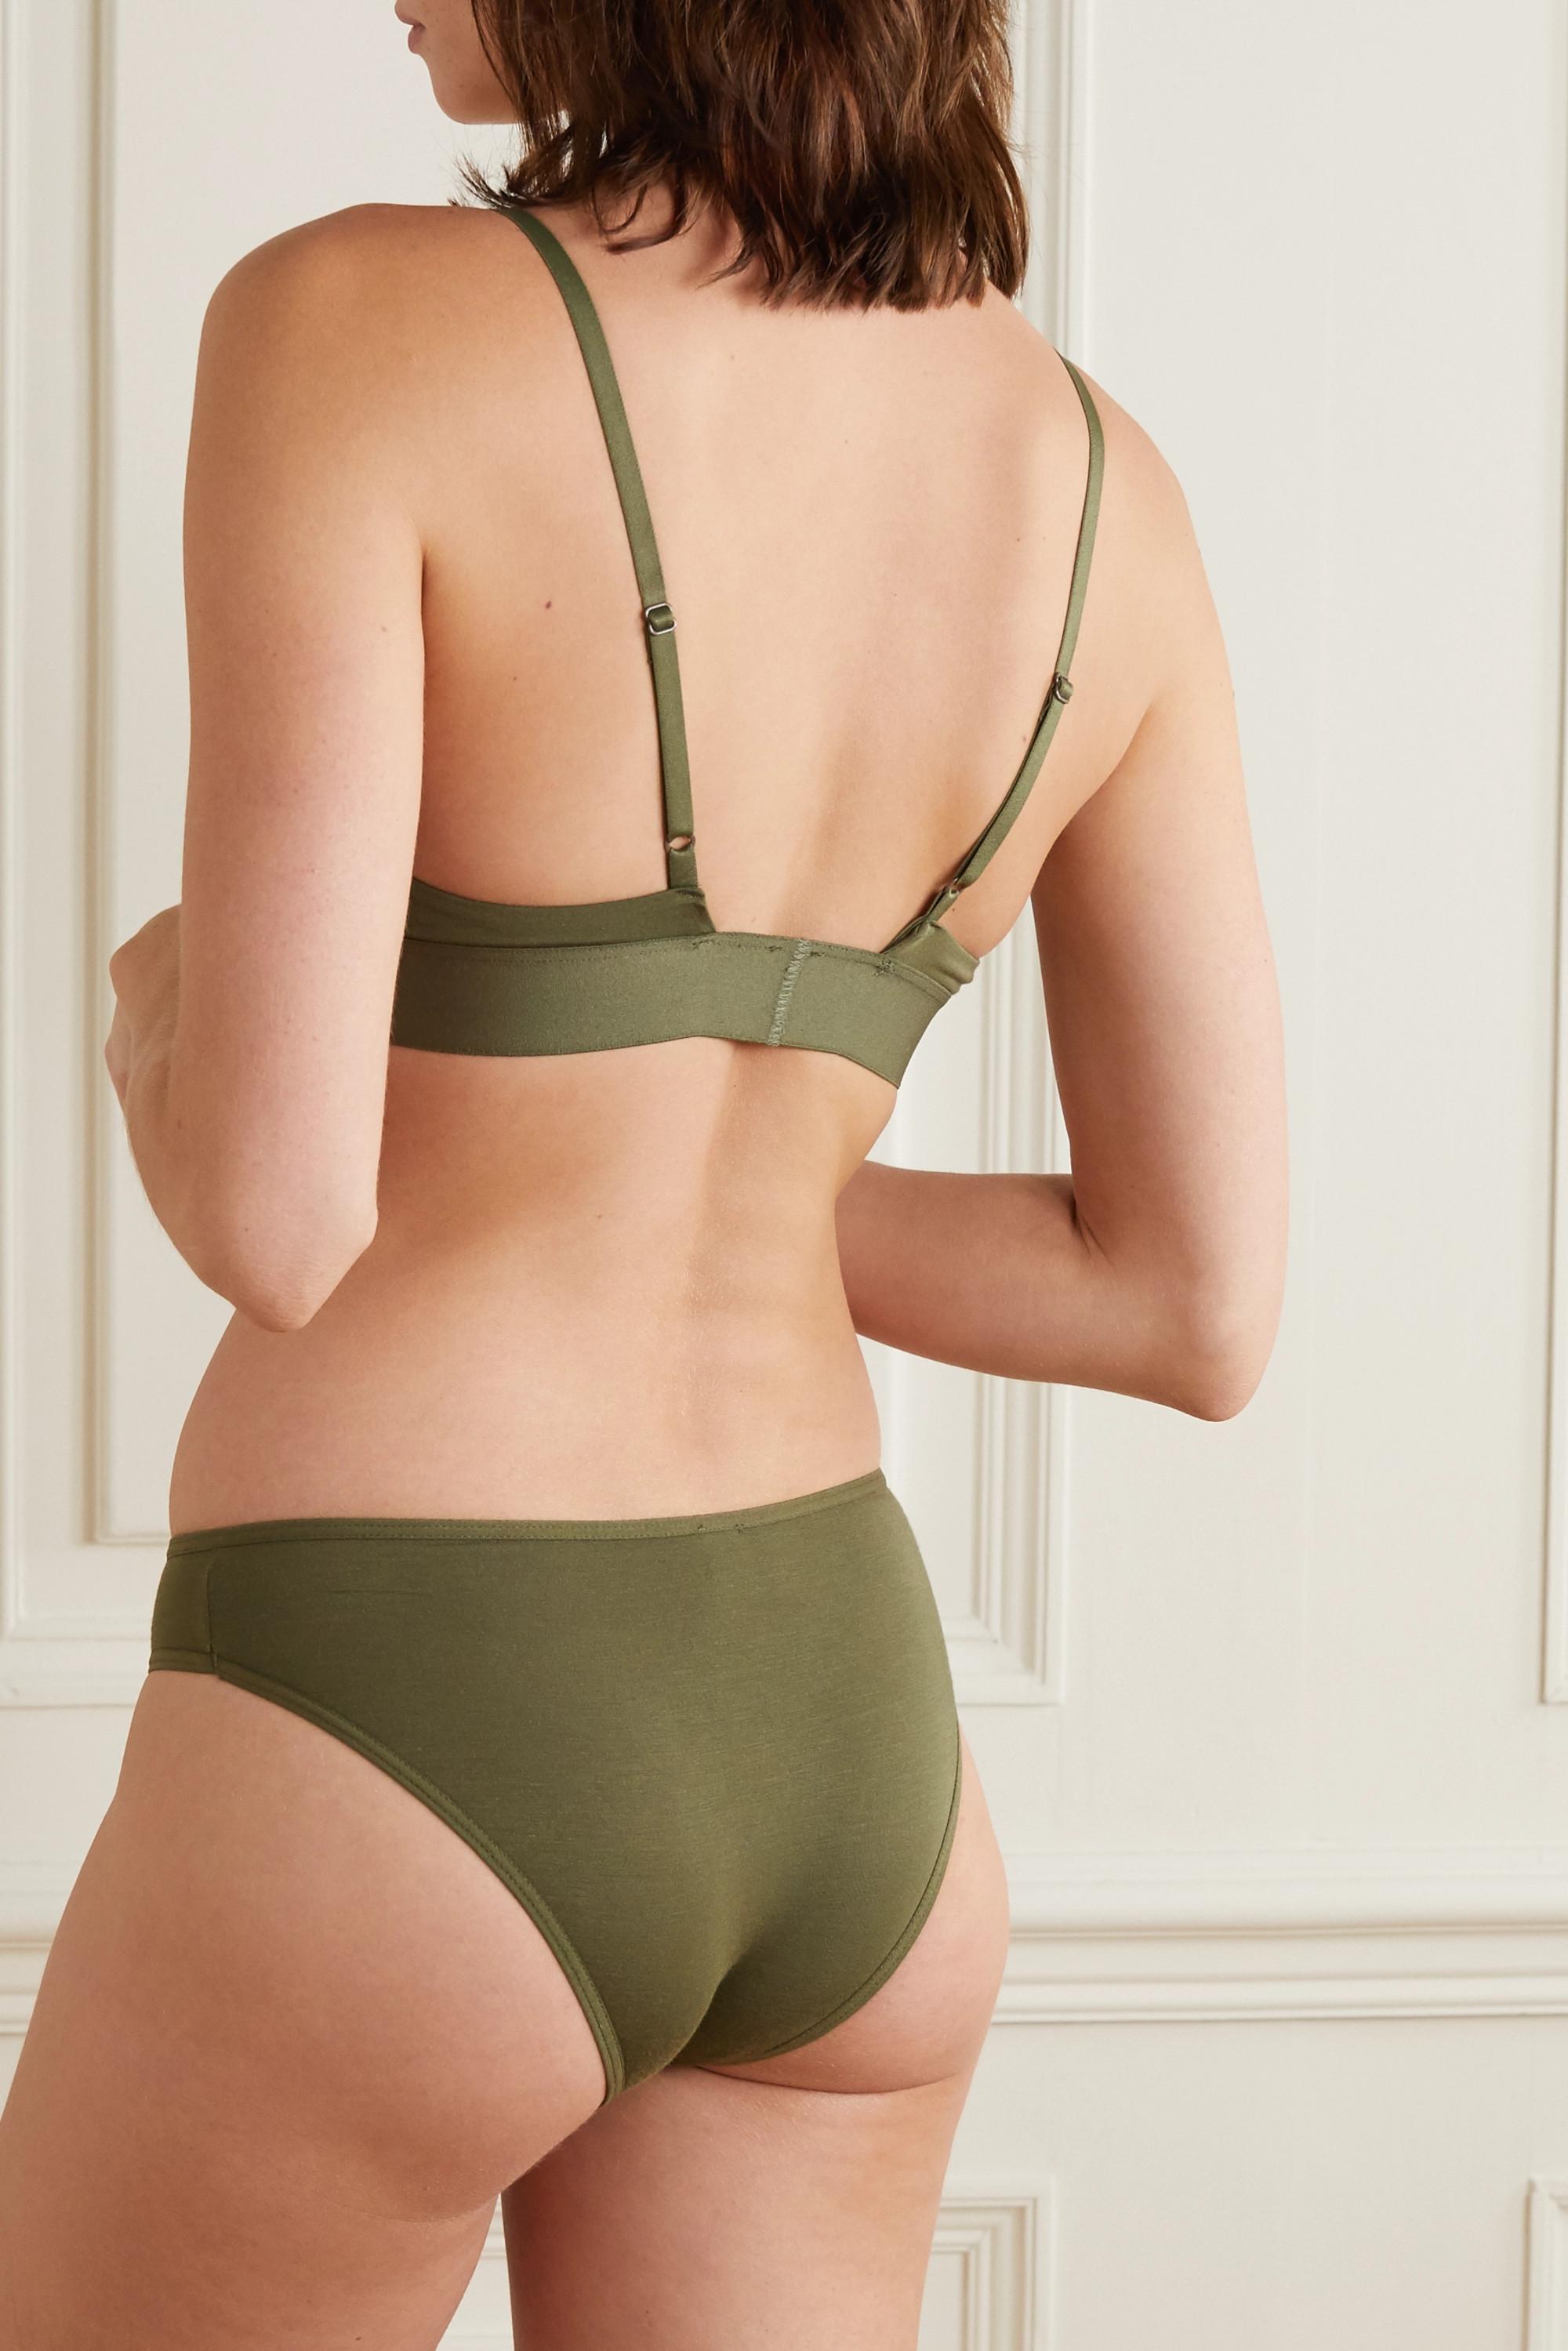 Army Green + Net Sustain Stretch-bamboo Triangle Bra | Baserange